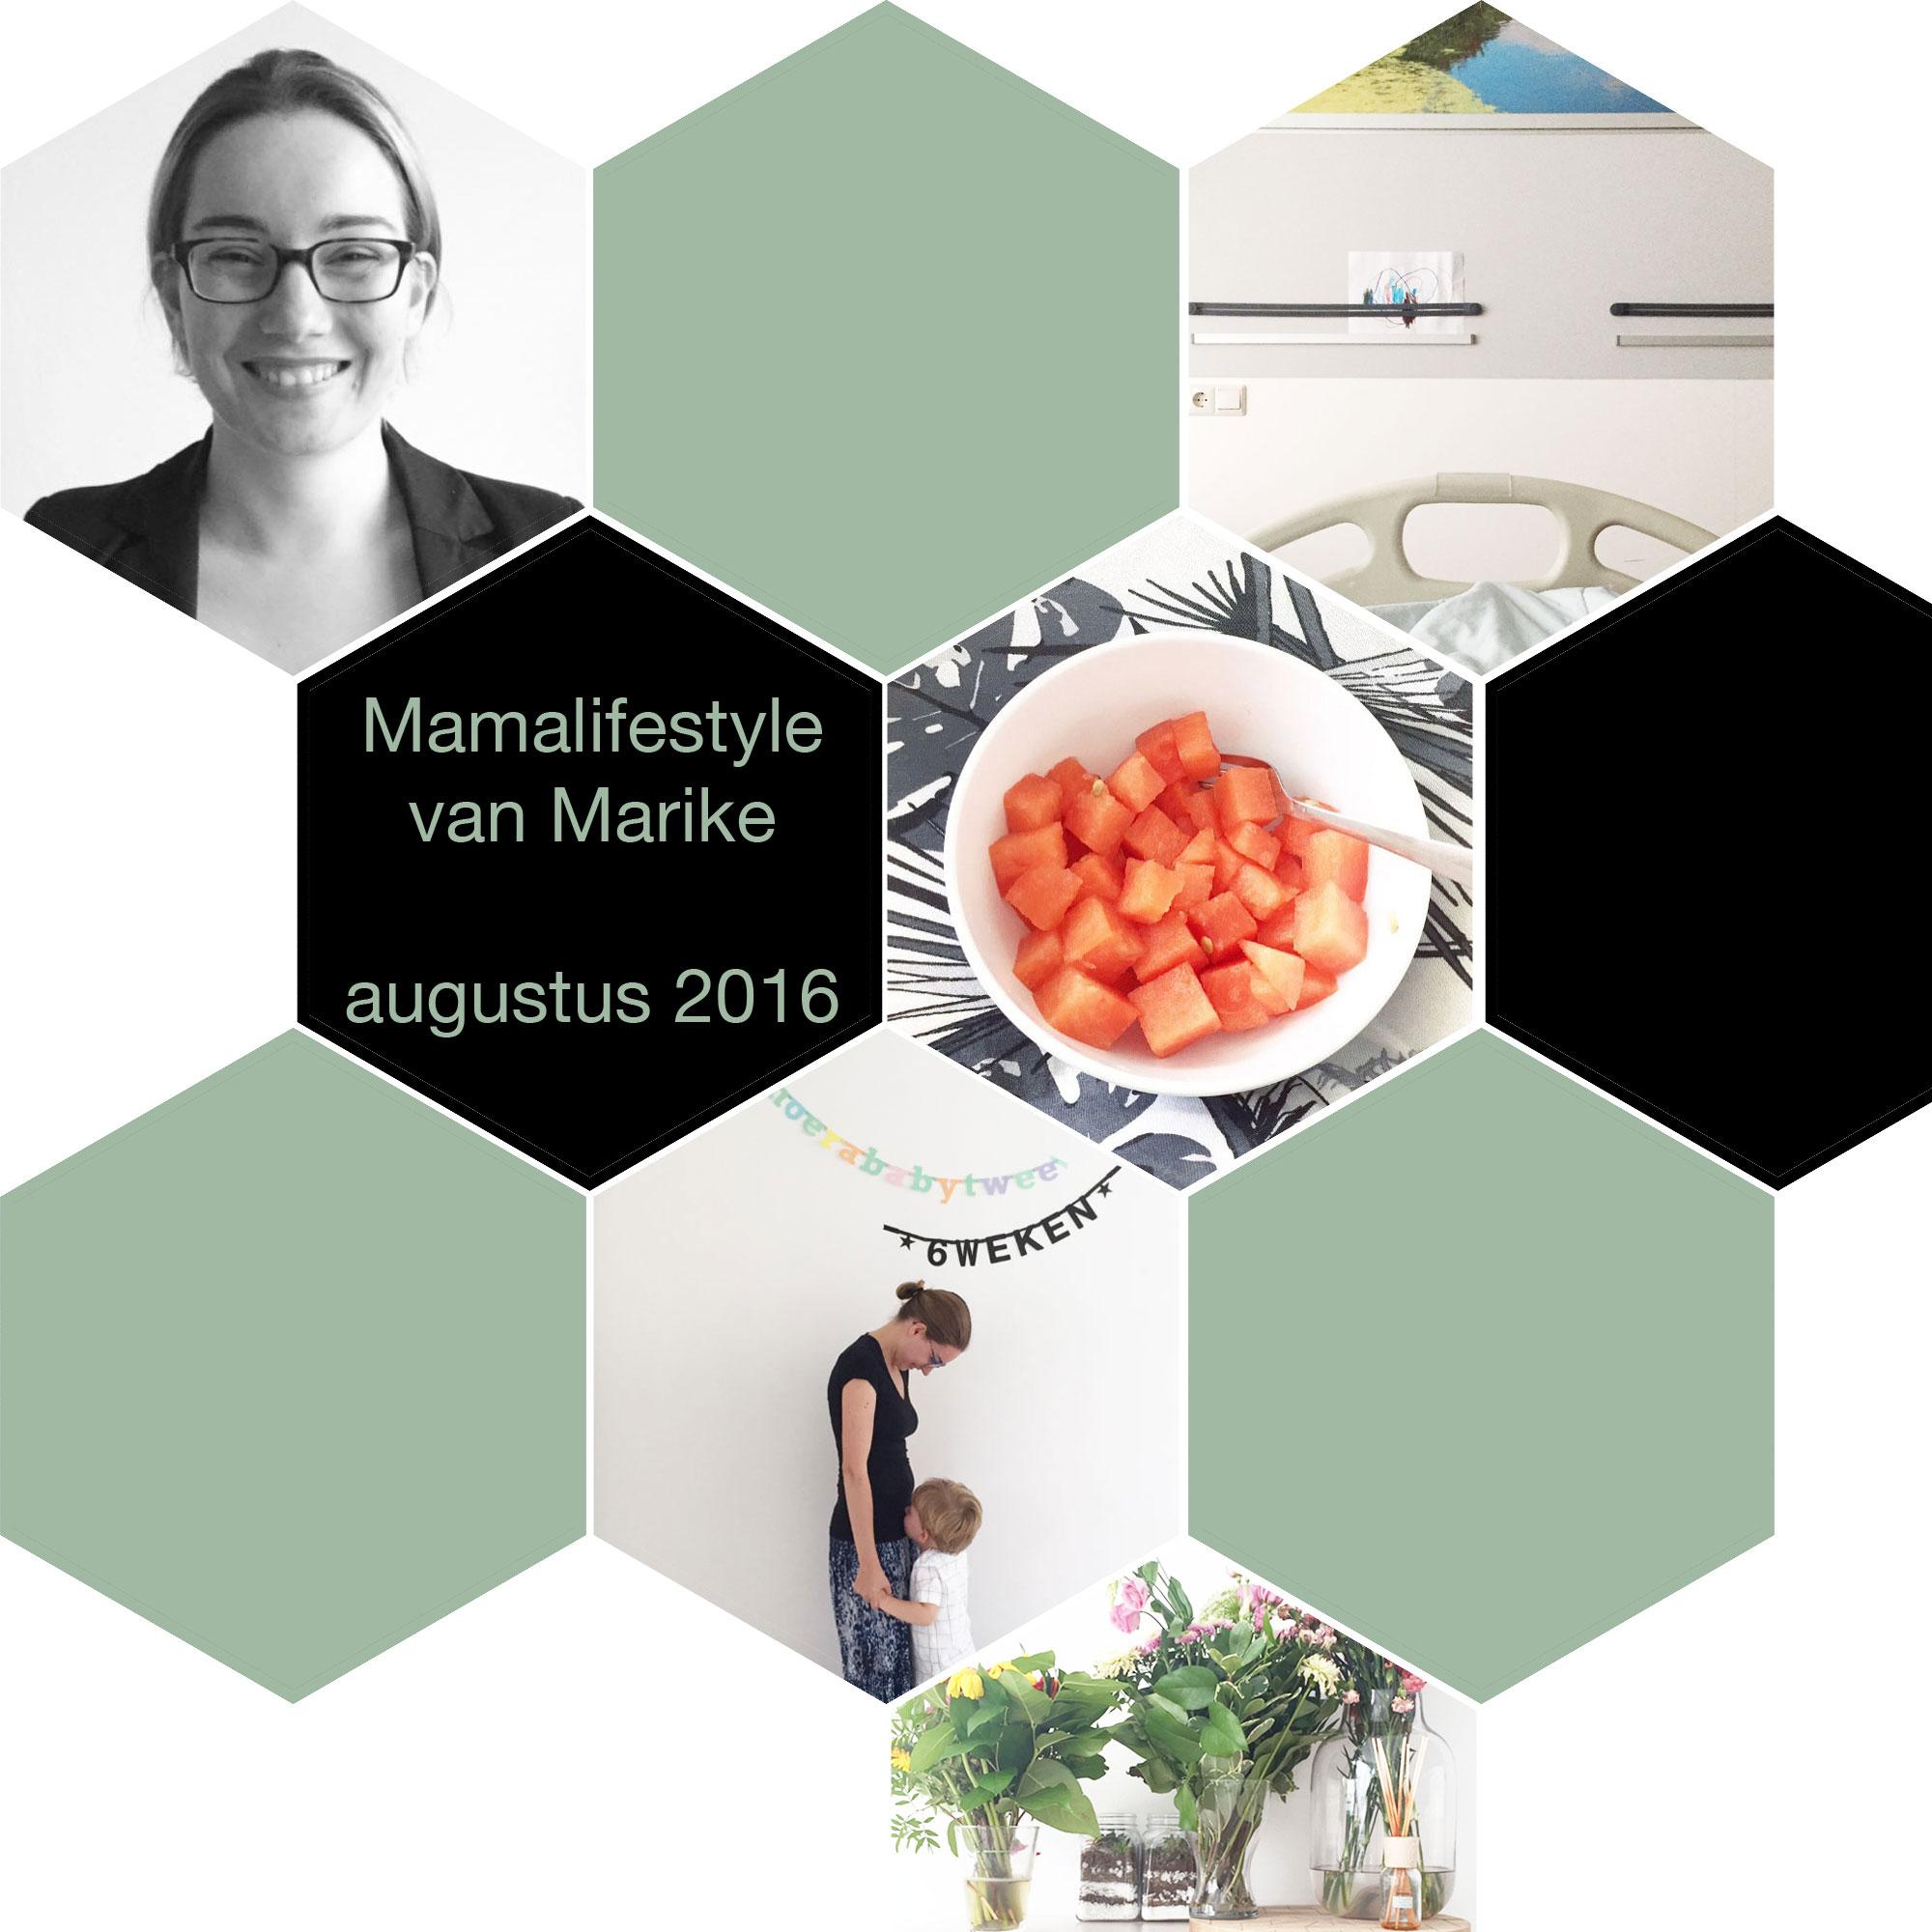 Mamalifestyle augustus 2016 overzicht